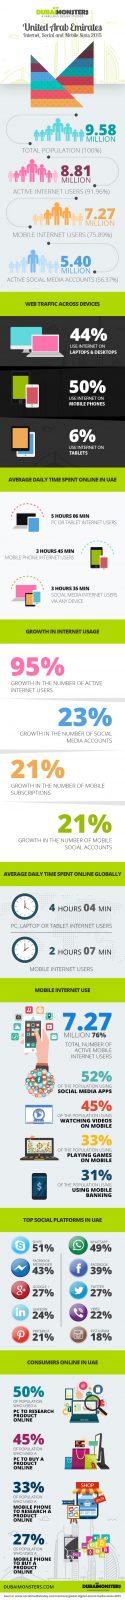 DM infographic